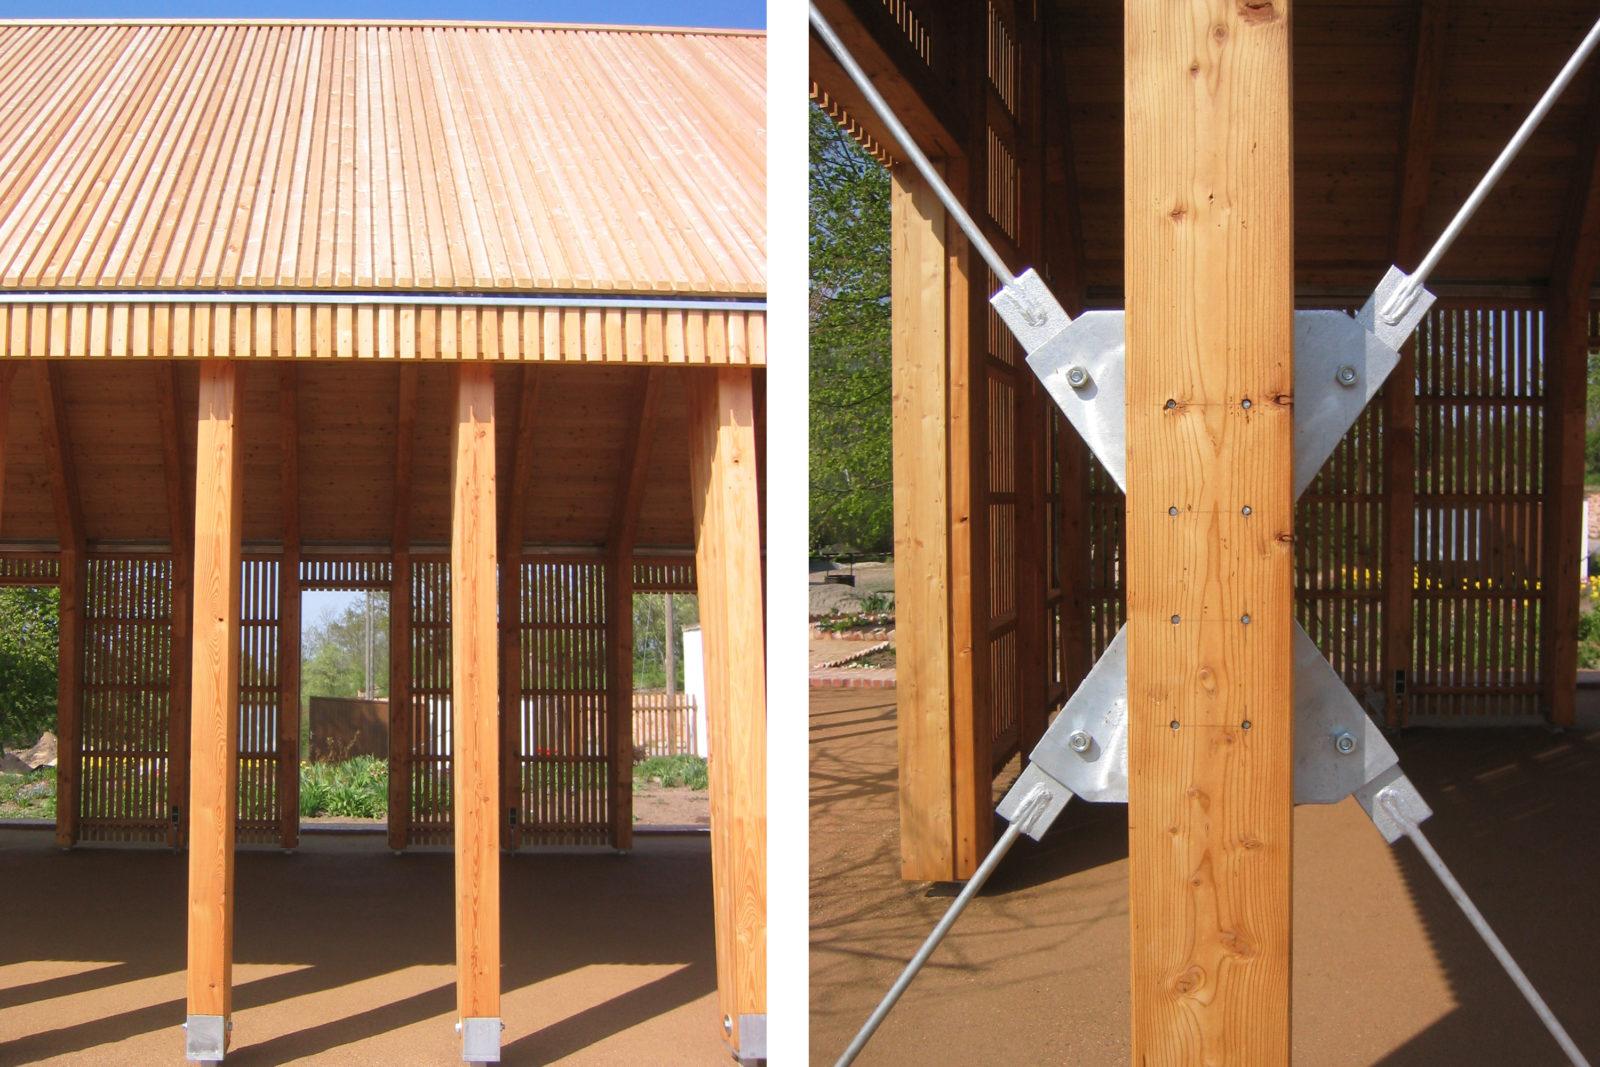 Pavillon im Park Canitz - Konstruktionsdetail